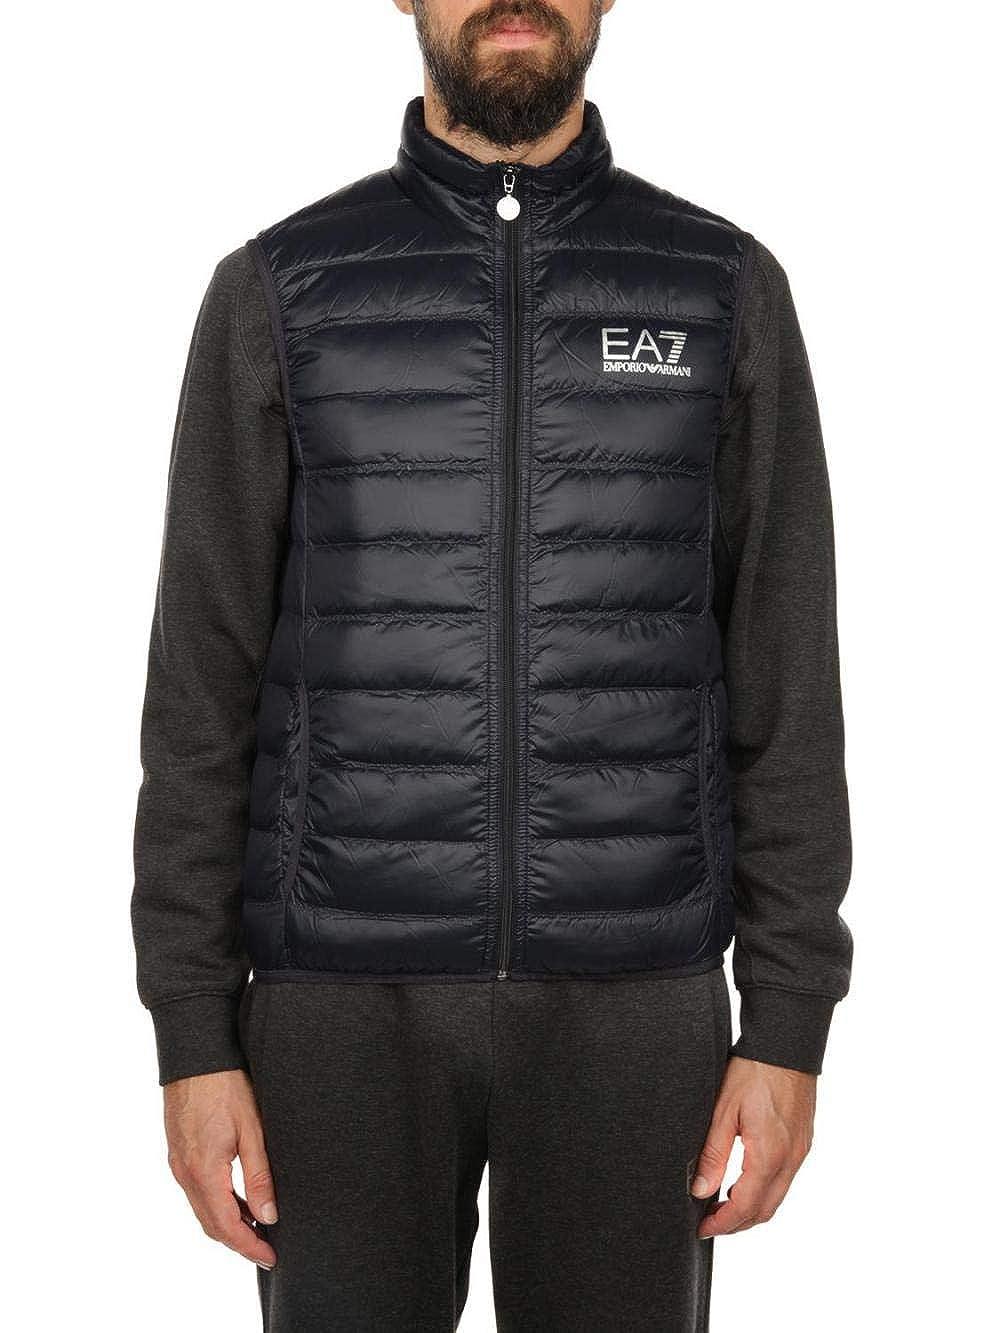 EA7 Emporio Armani Doudoune 8NPQ01 Noir 1200